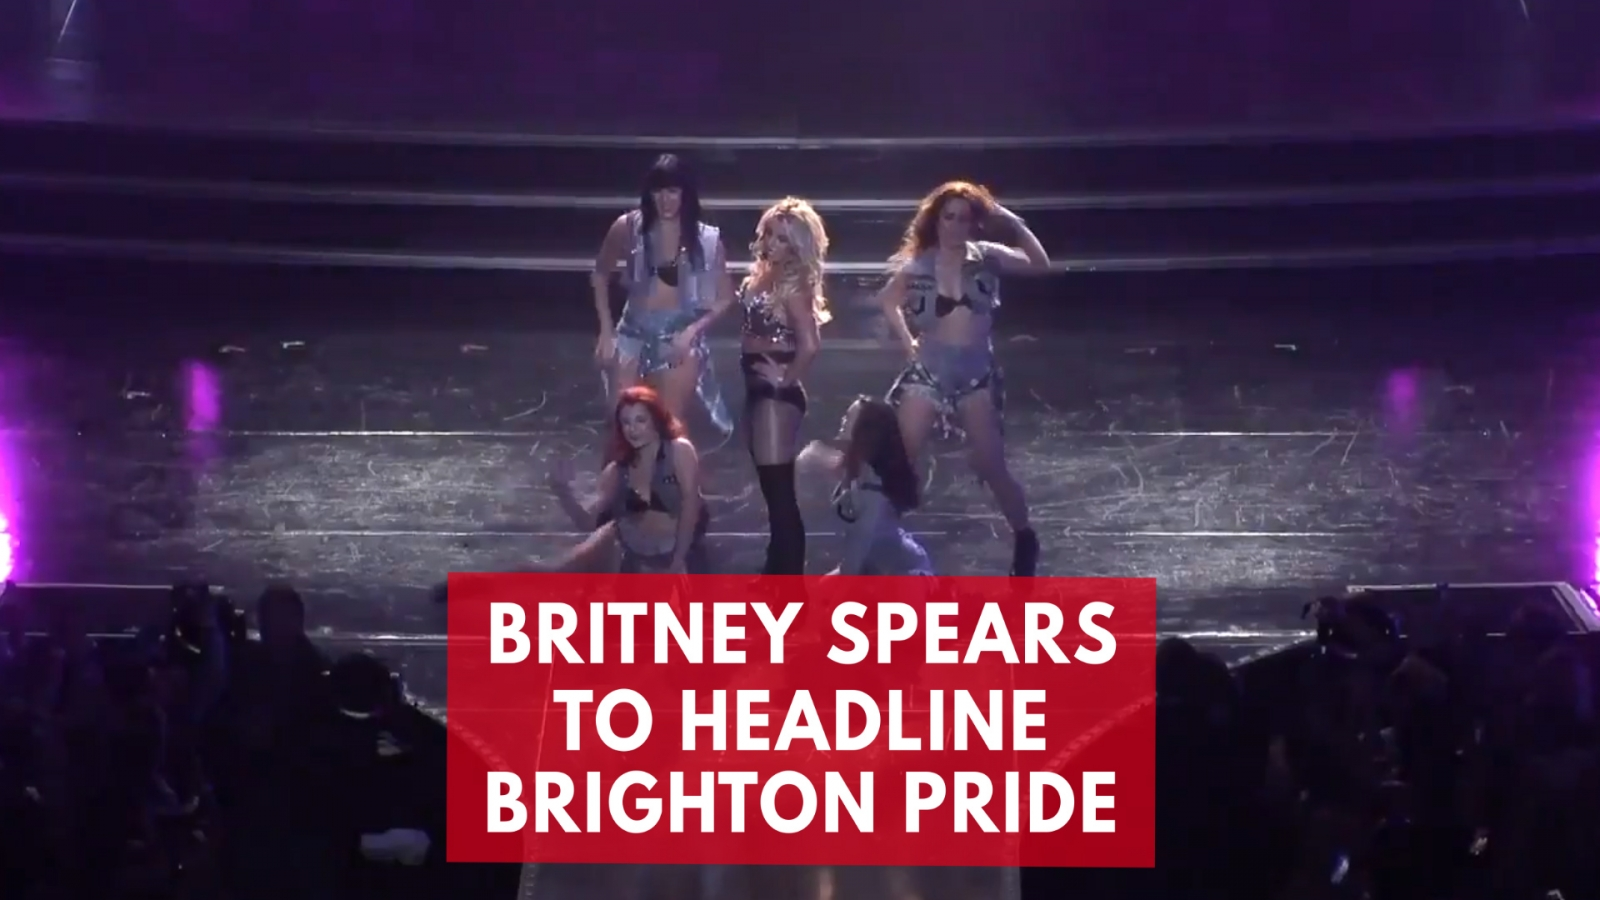 britney-spears-to-headline-brighton-pride-during-u-k-tour